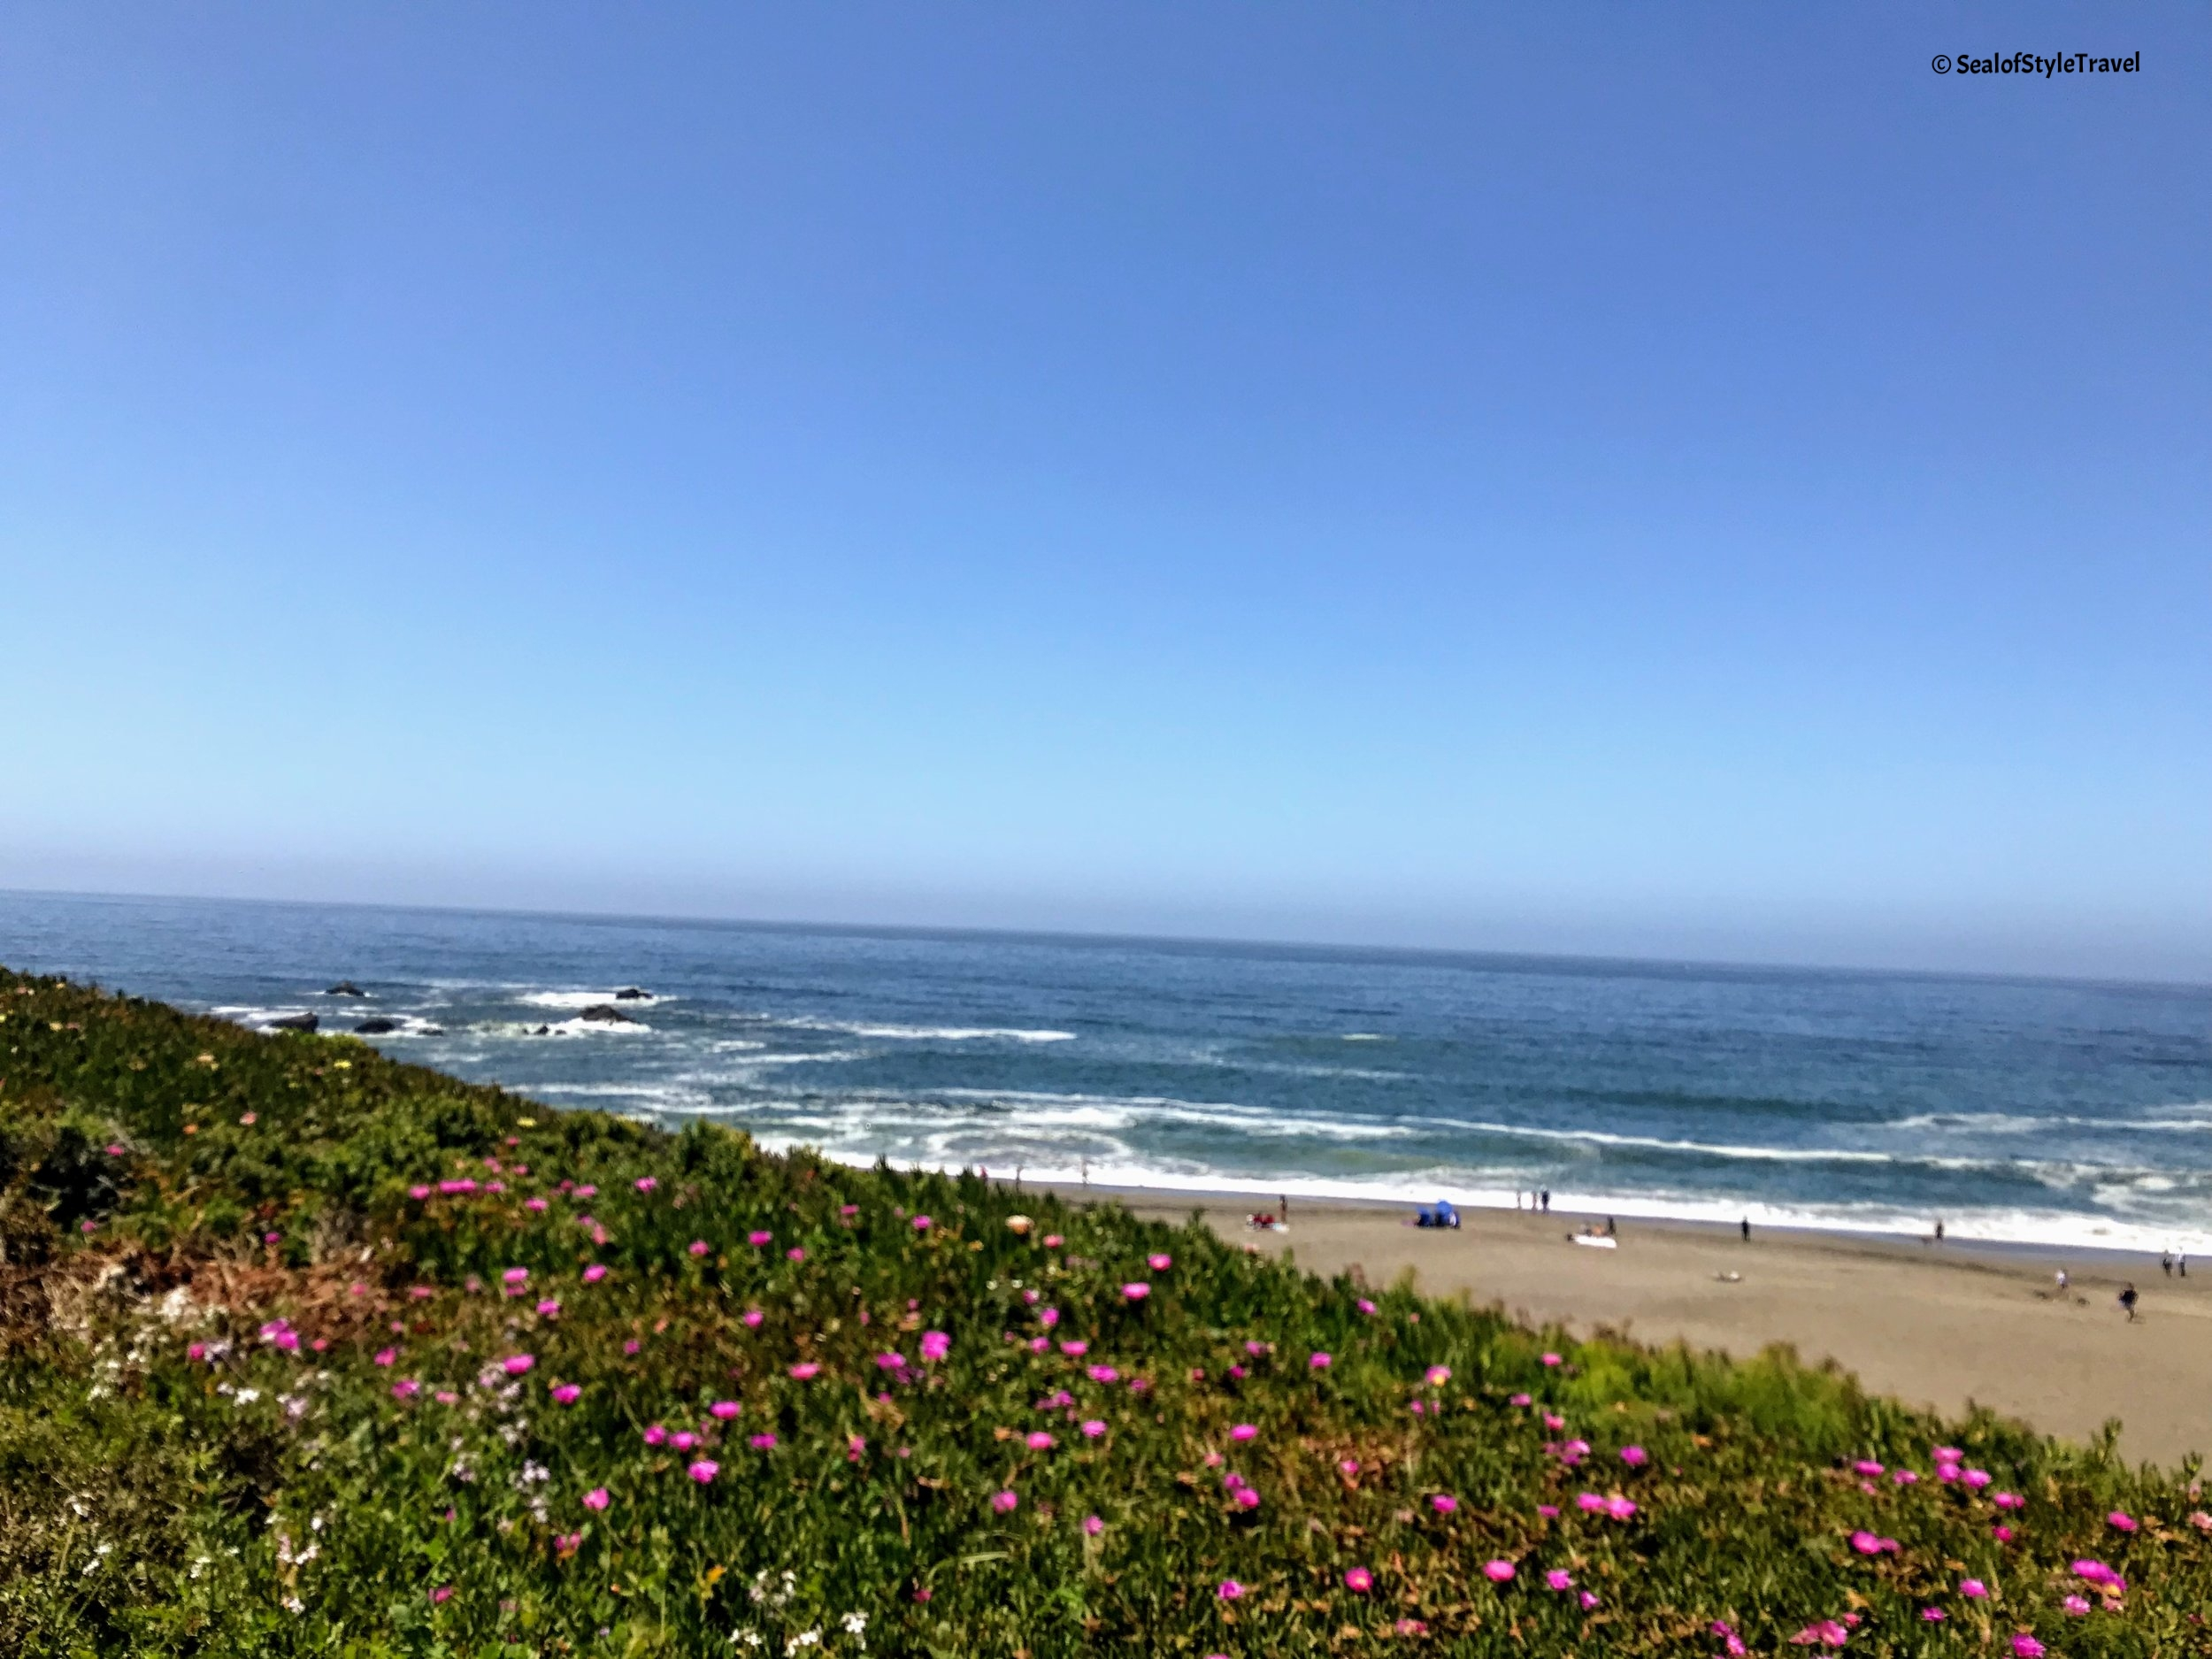 One of the pretty beaches along the coastline